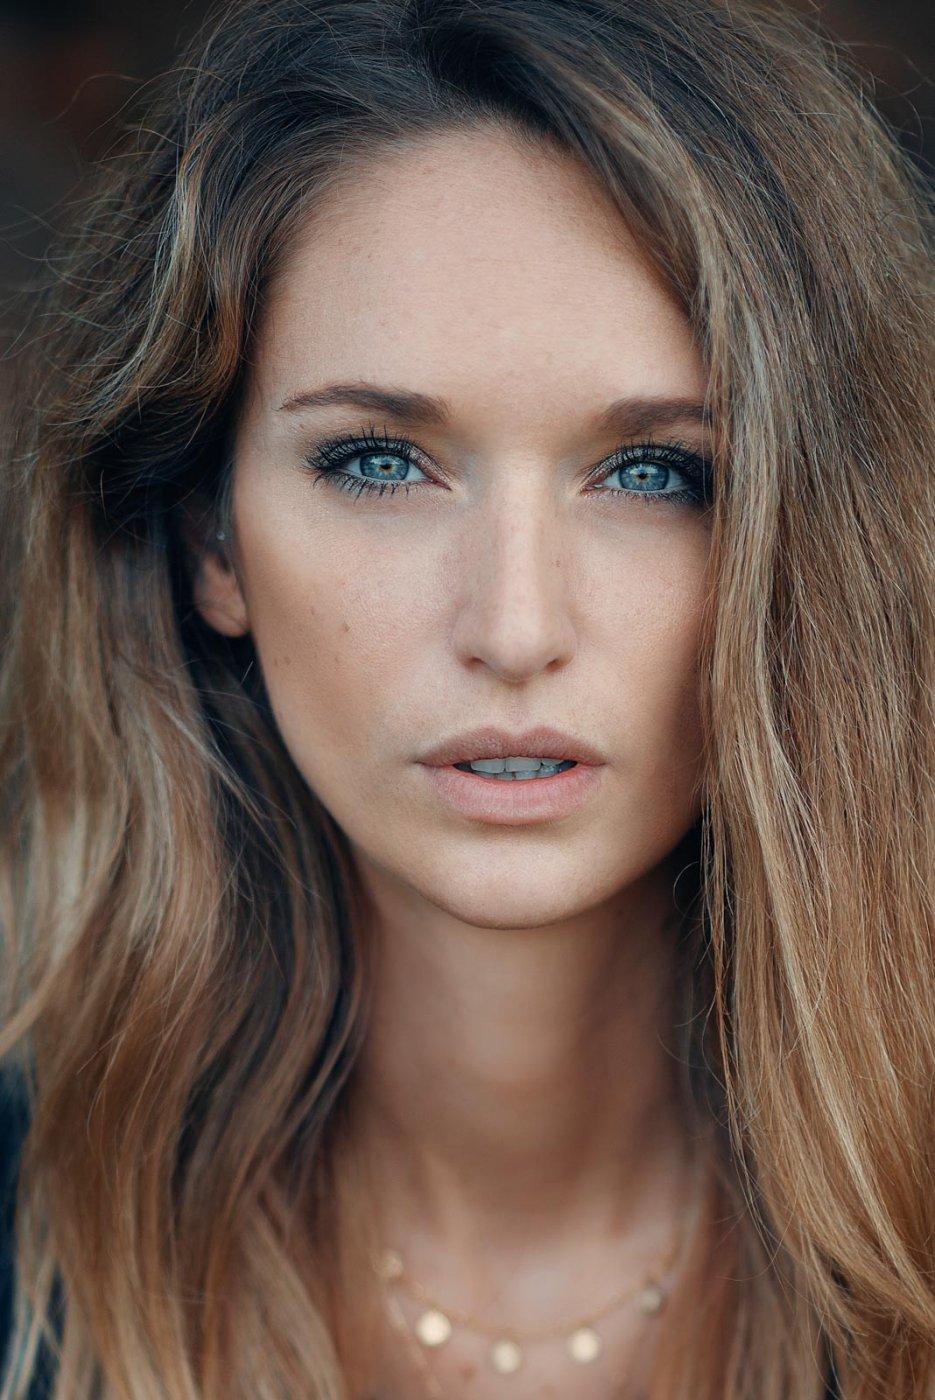 Portrait Photography By Anastasia Vervueren Close Up